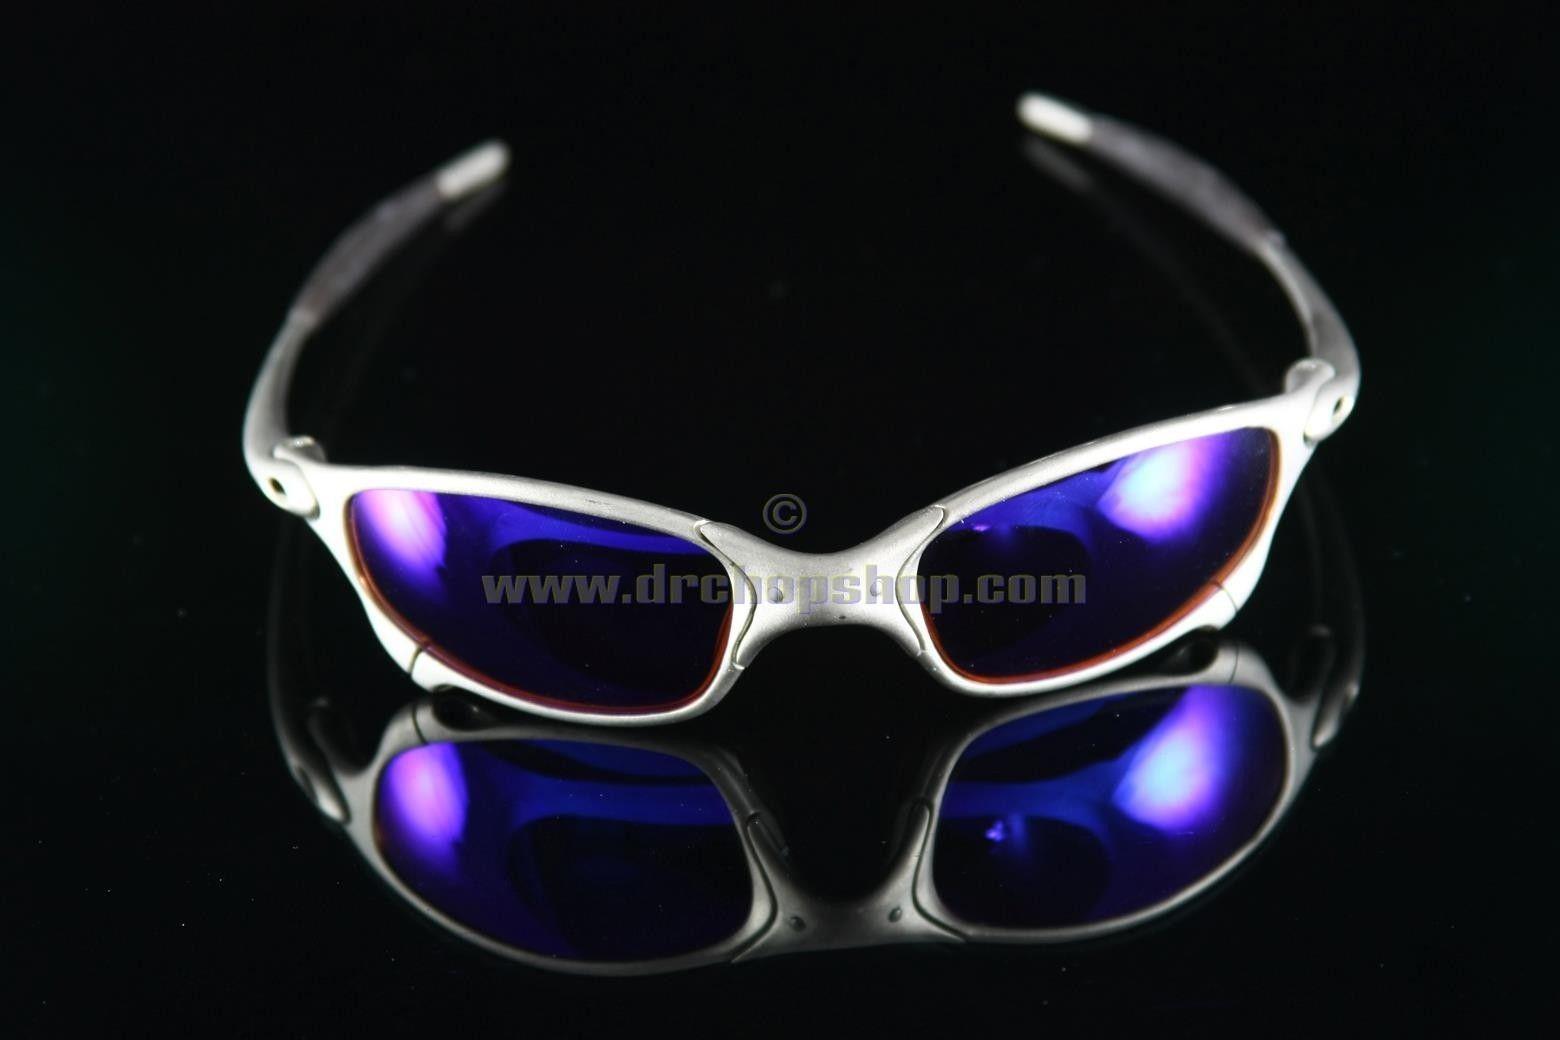 Custom X Metal Lenses Penny, XX, And Juliet - 901654_586284901383200_1405228848_o.jpg